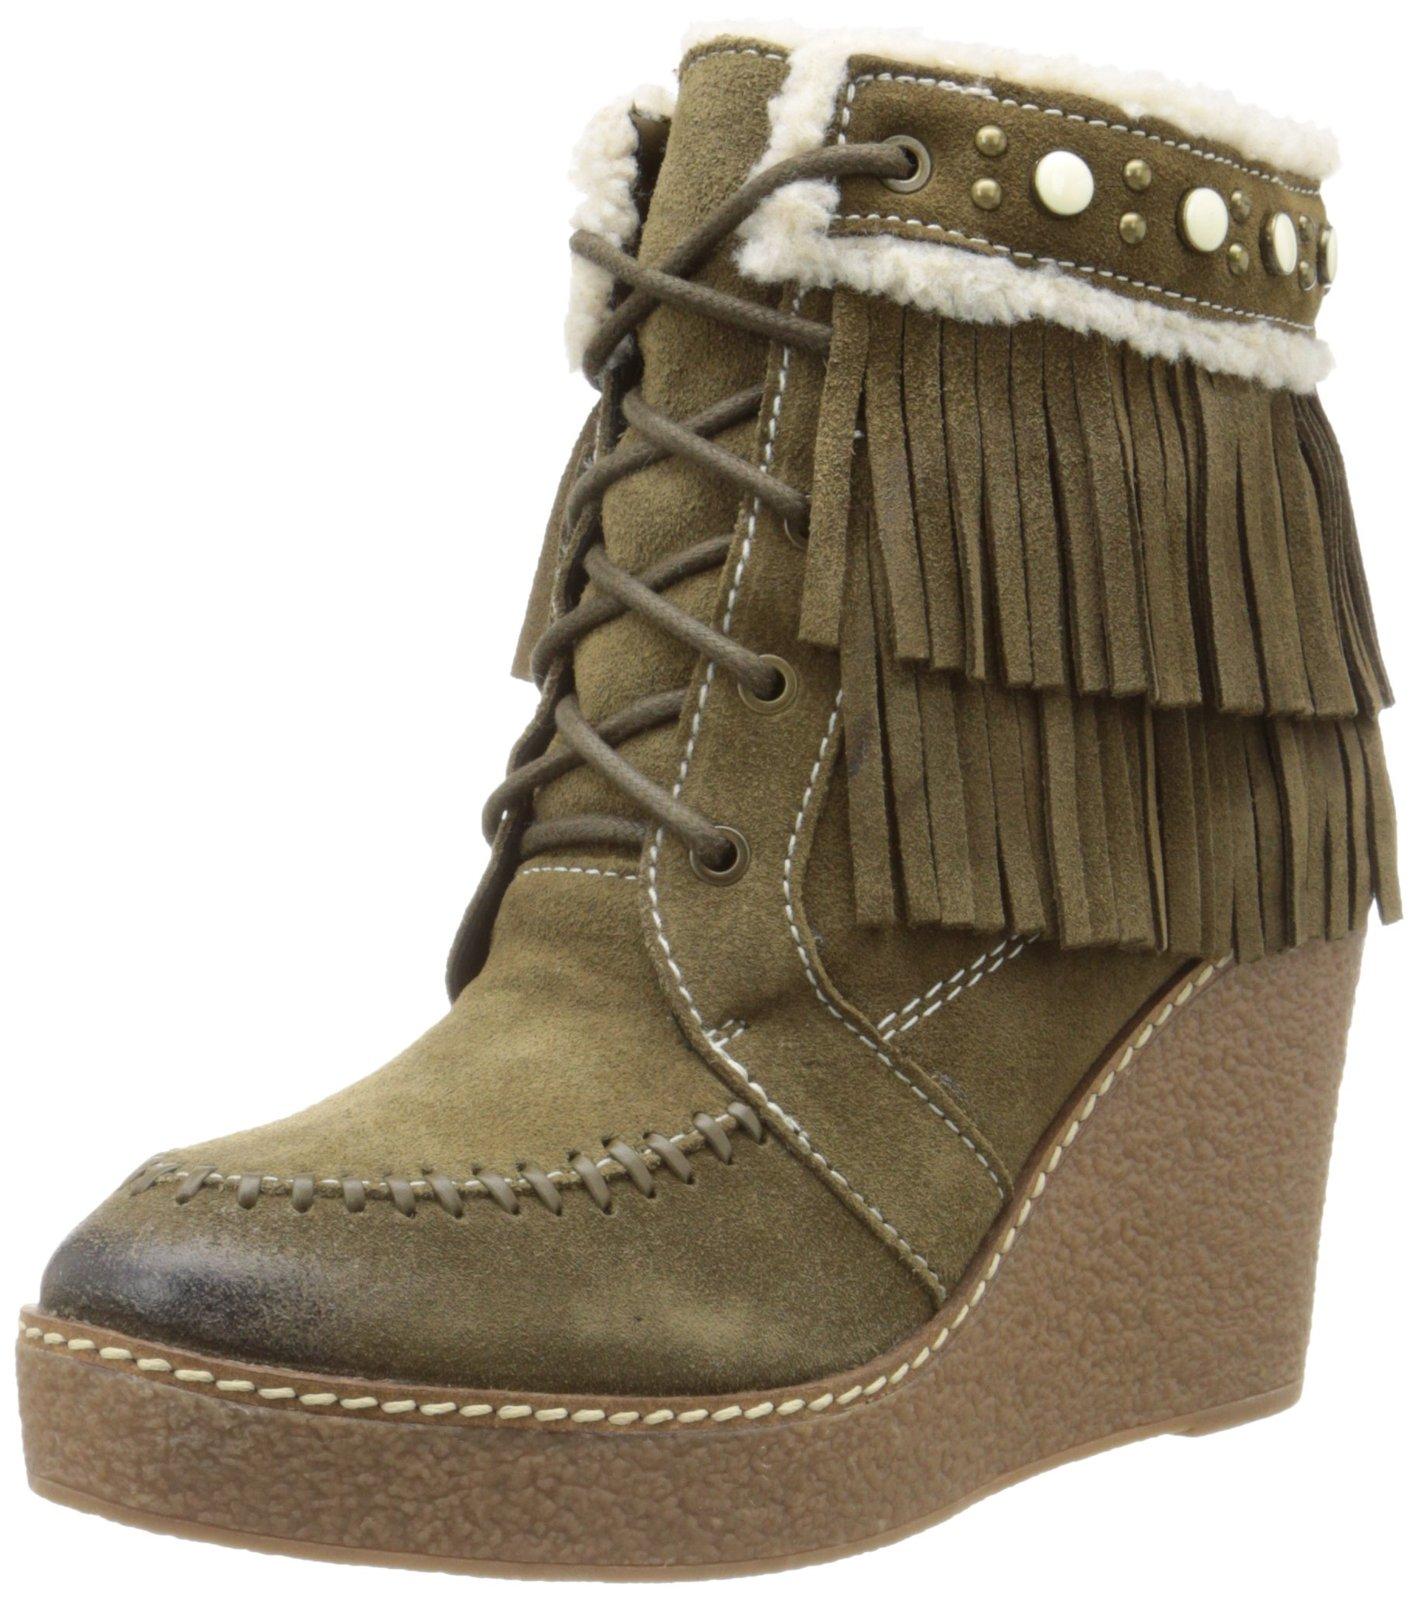 eae9567ba6ad4 Sam Edelman Women s Kemper Boot